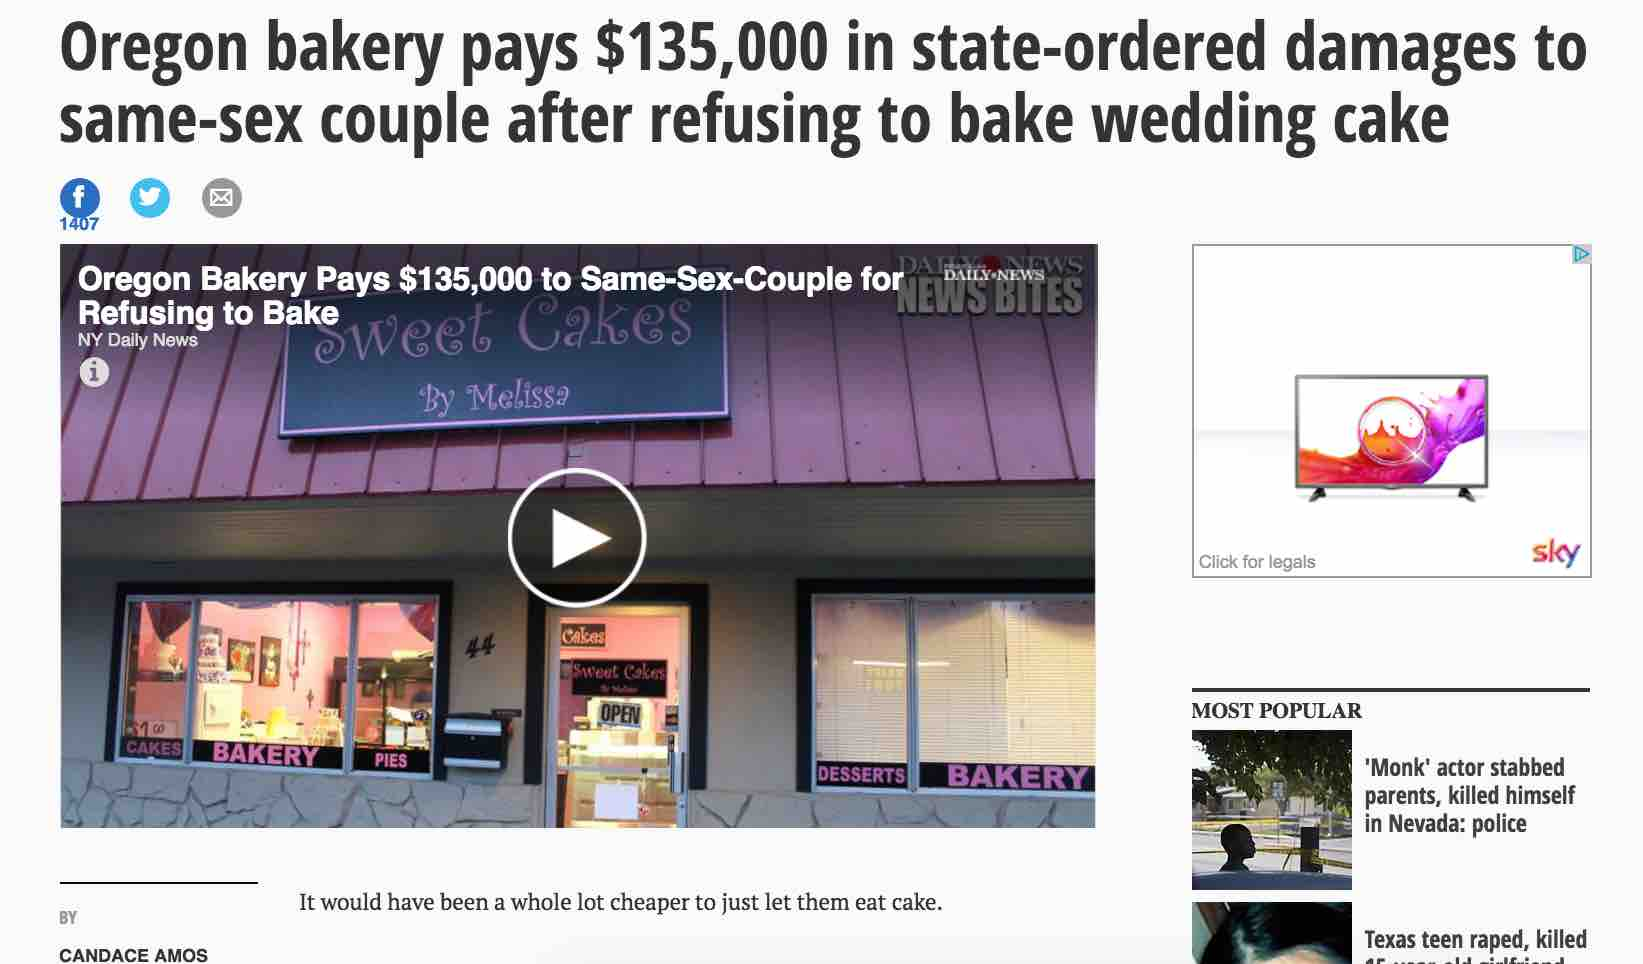 Oregon bakery fine